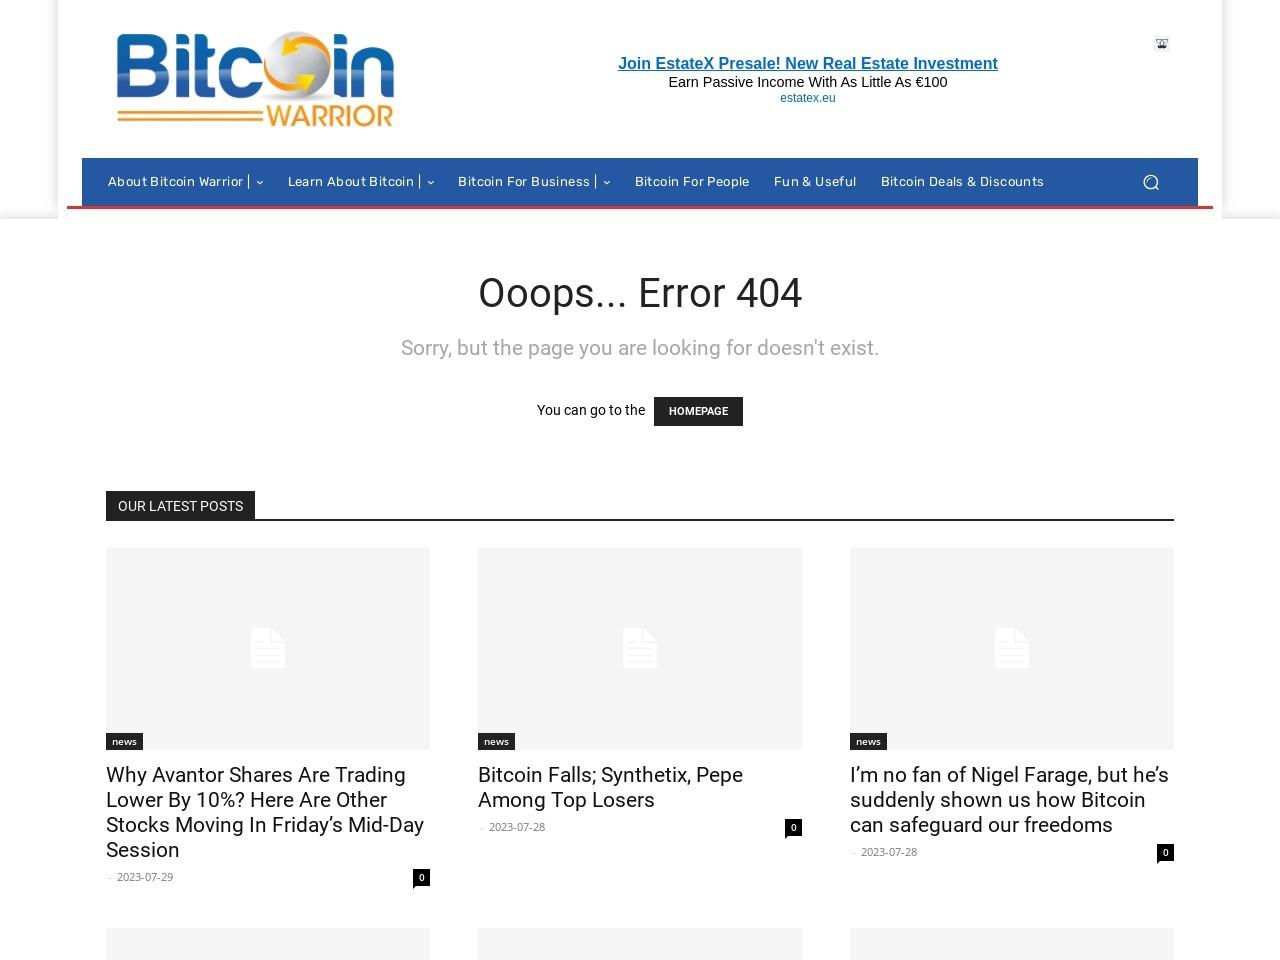 Bitcoin Breaks $30K, XRP Crashes, Institutional Investors Adopt Crypto